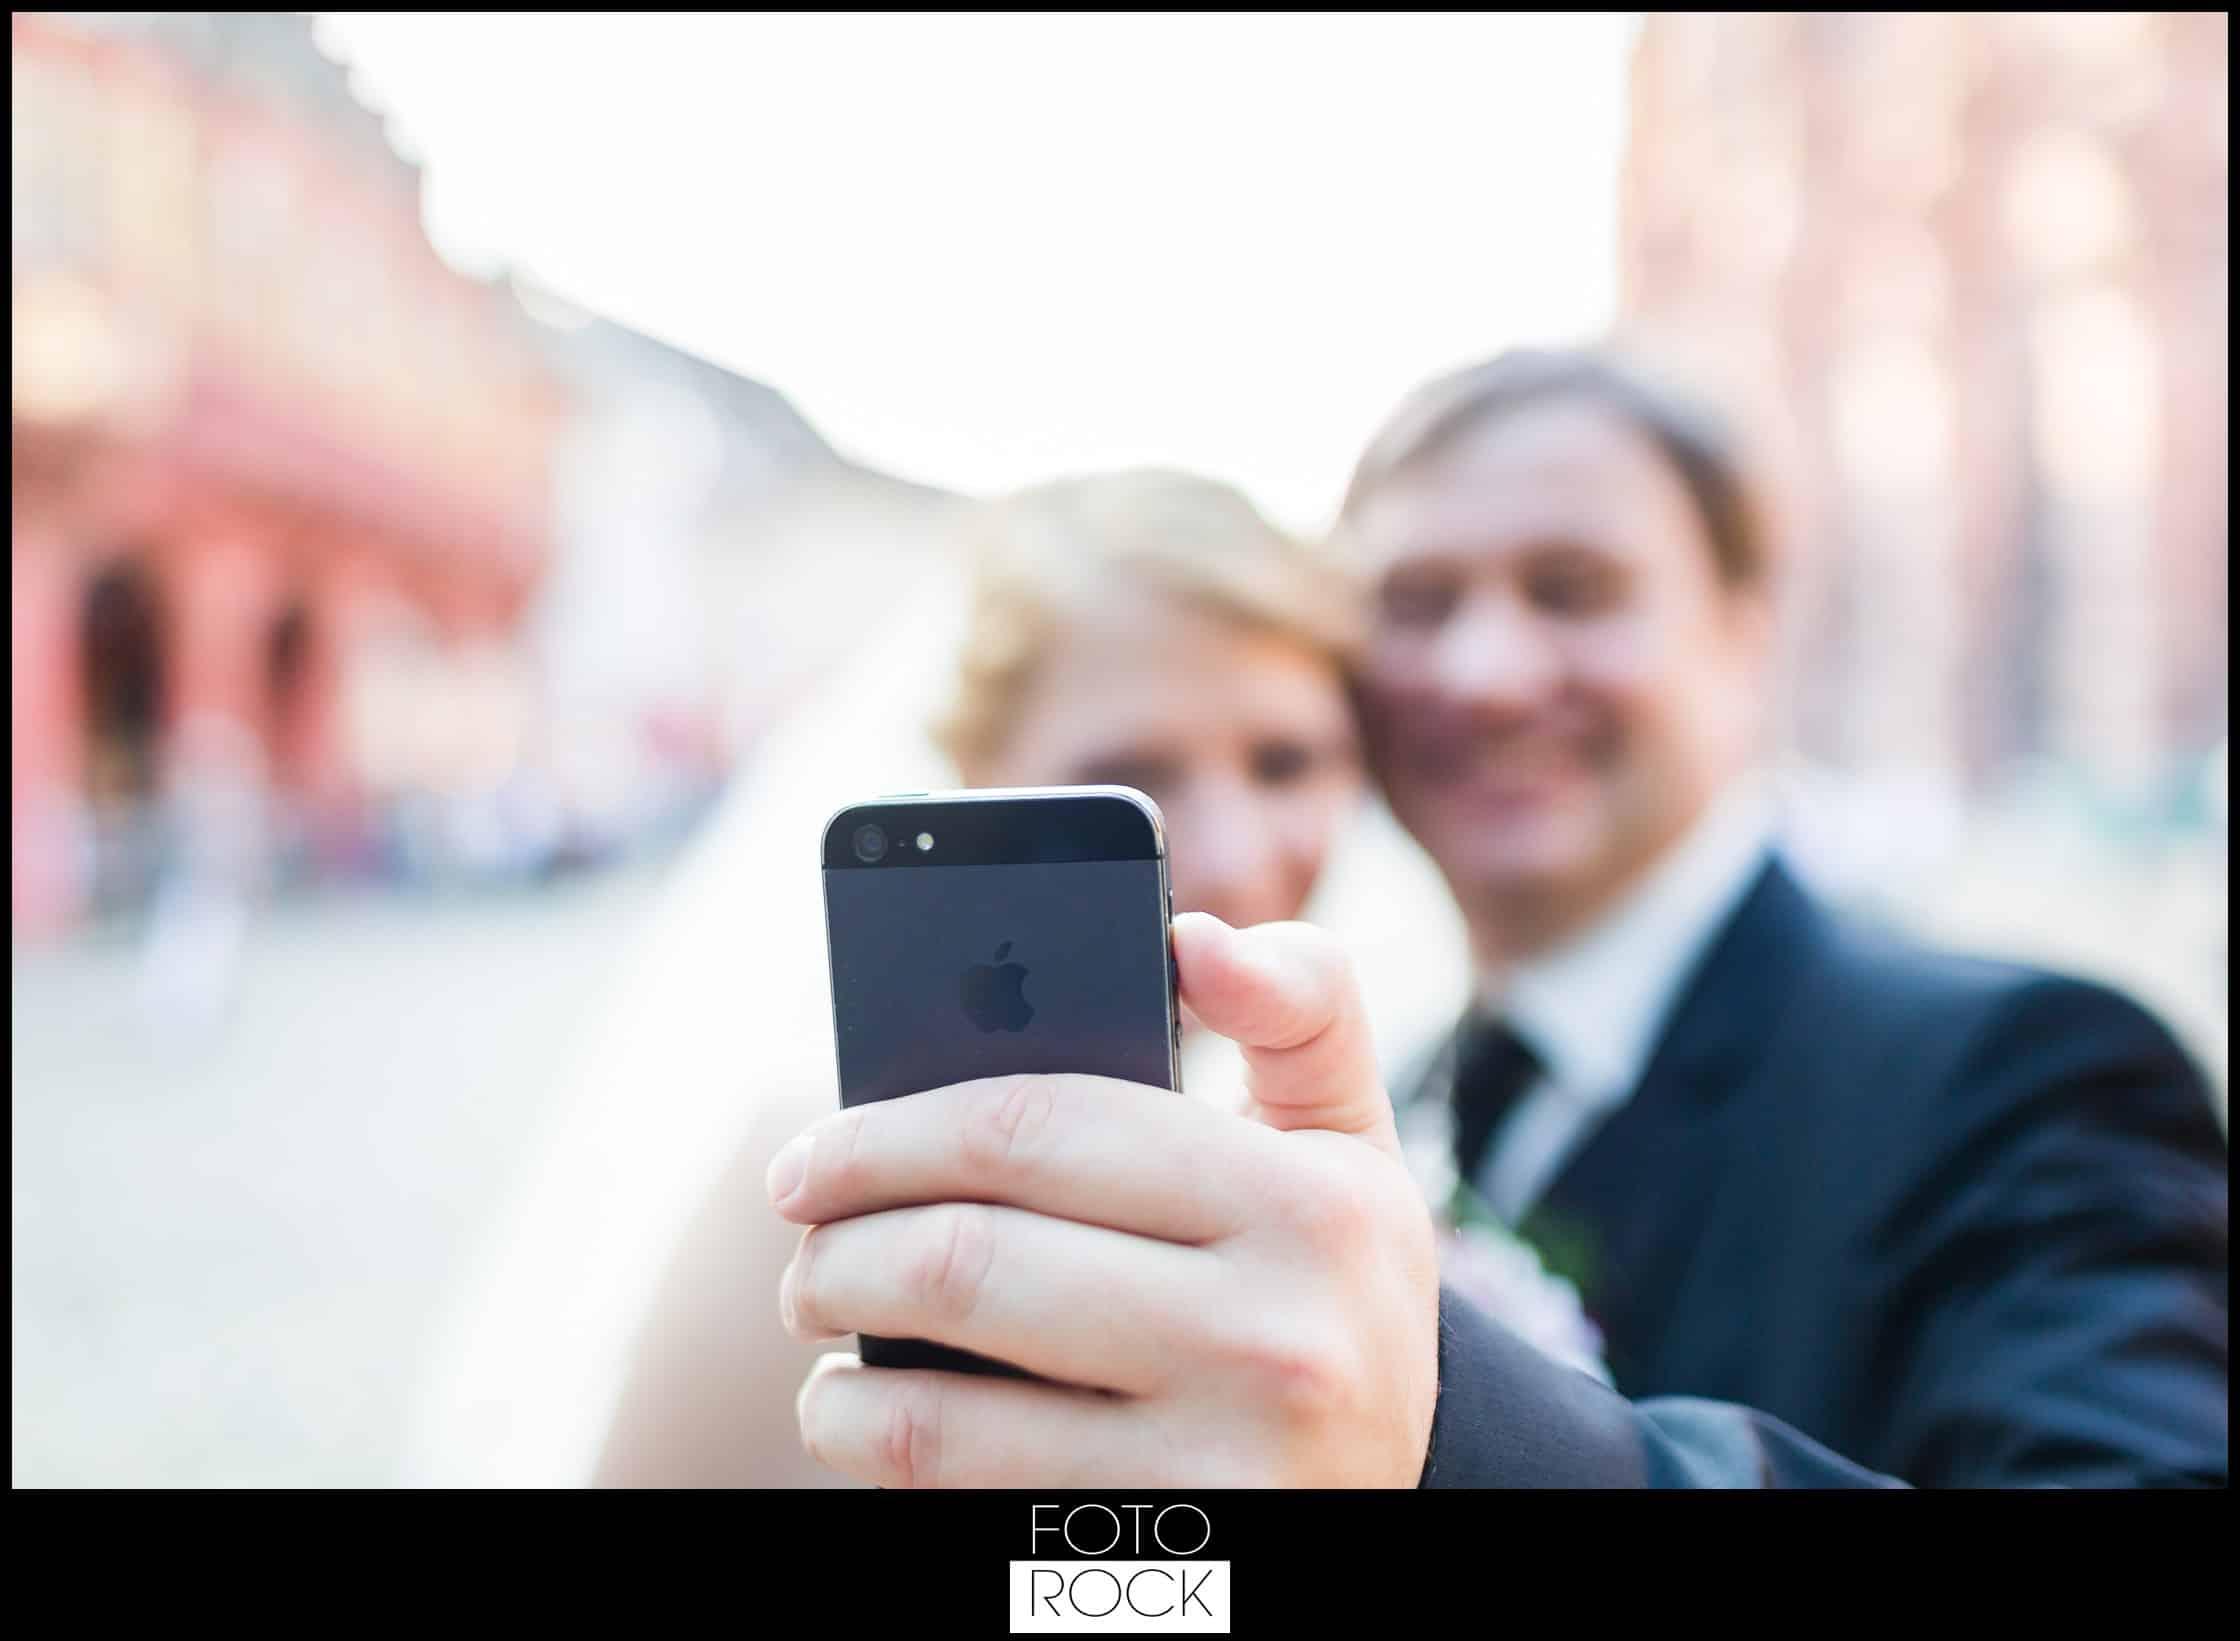 Hochzeit Freiburg Muenster Goldener Adler Oberried selfie iphone brautpaar